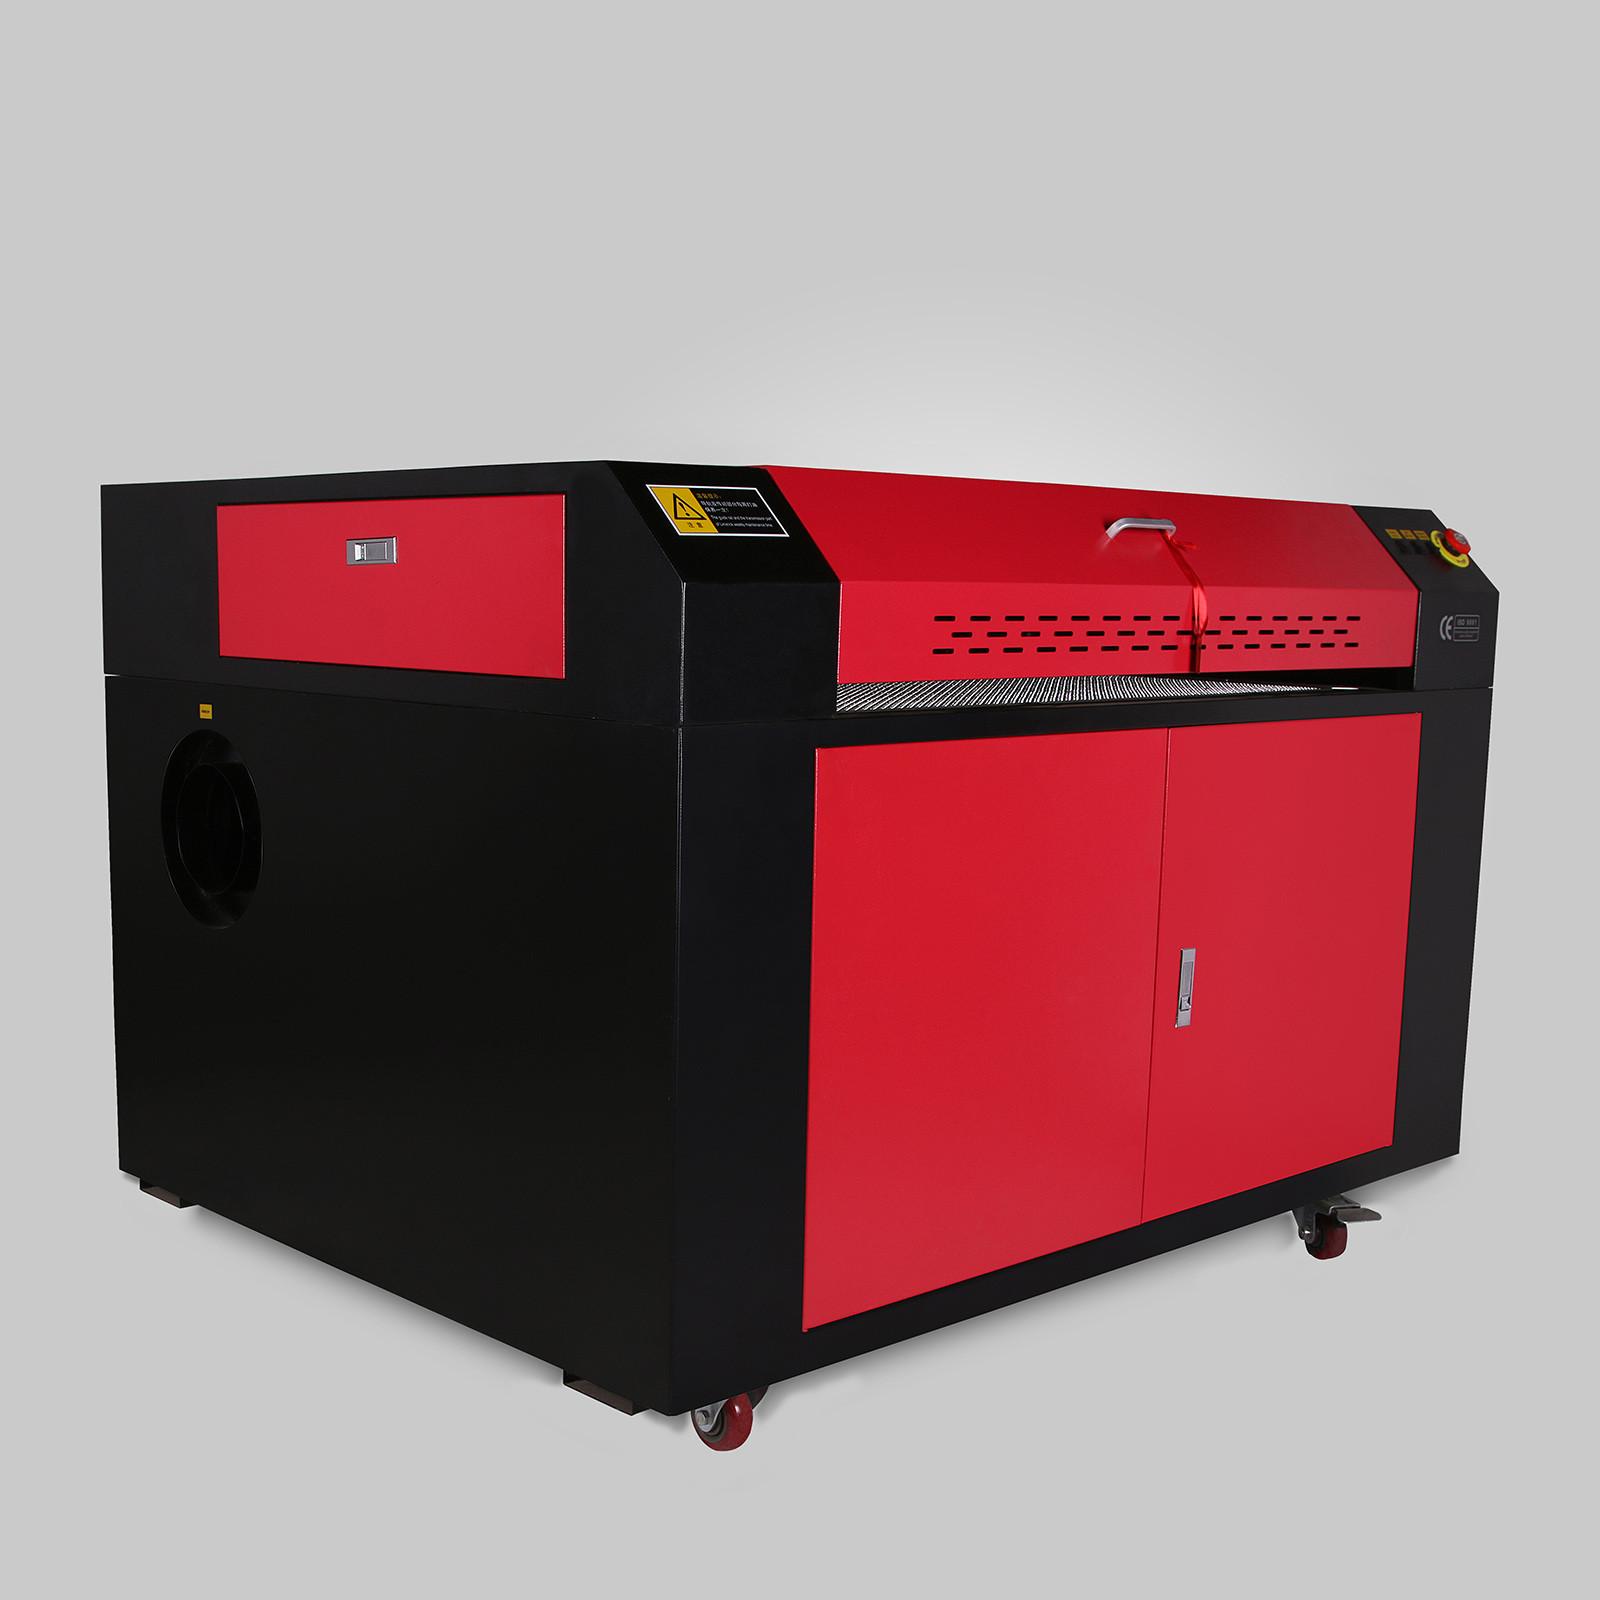 Macchina-per-Incisione-Laser-CO2-40-130W-Asse-Rotante-Tagliatrice-Incisore miniatura 65